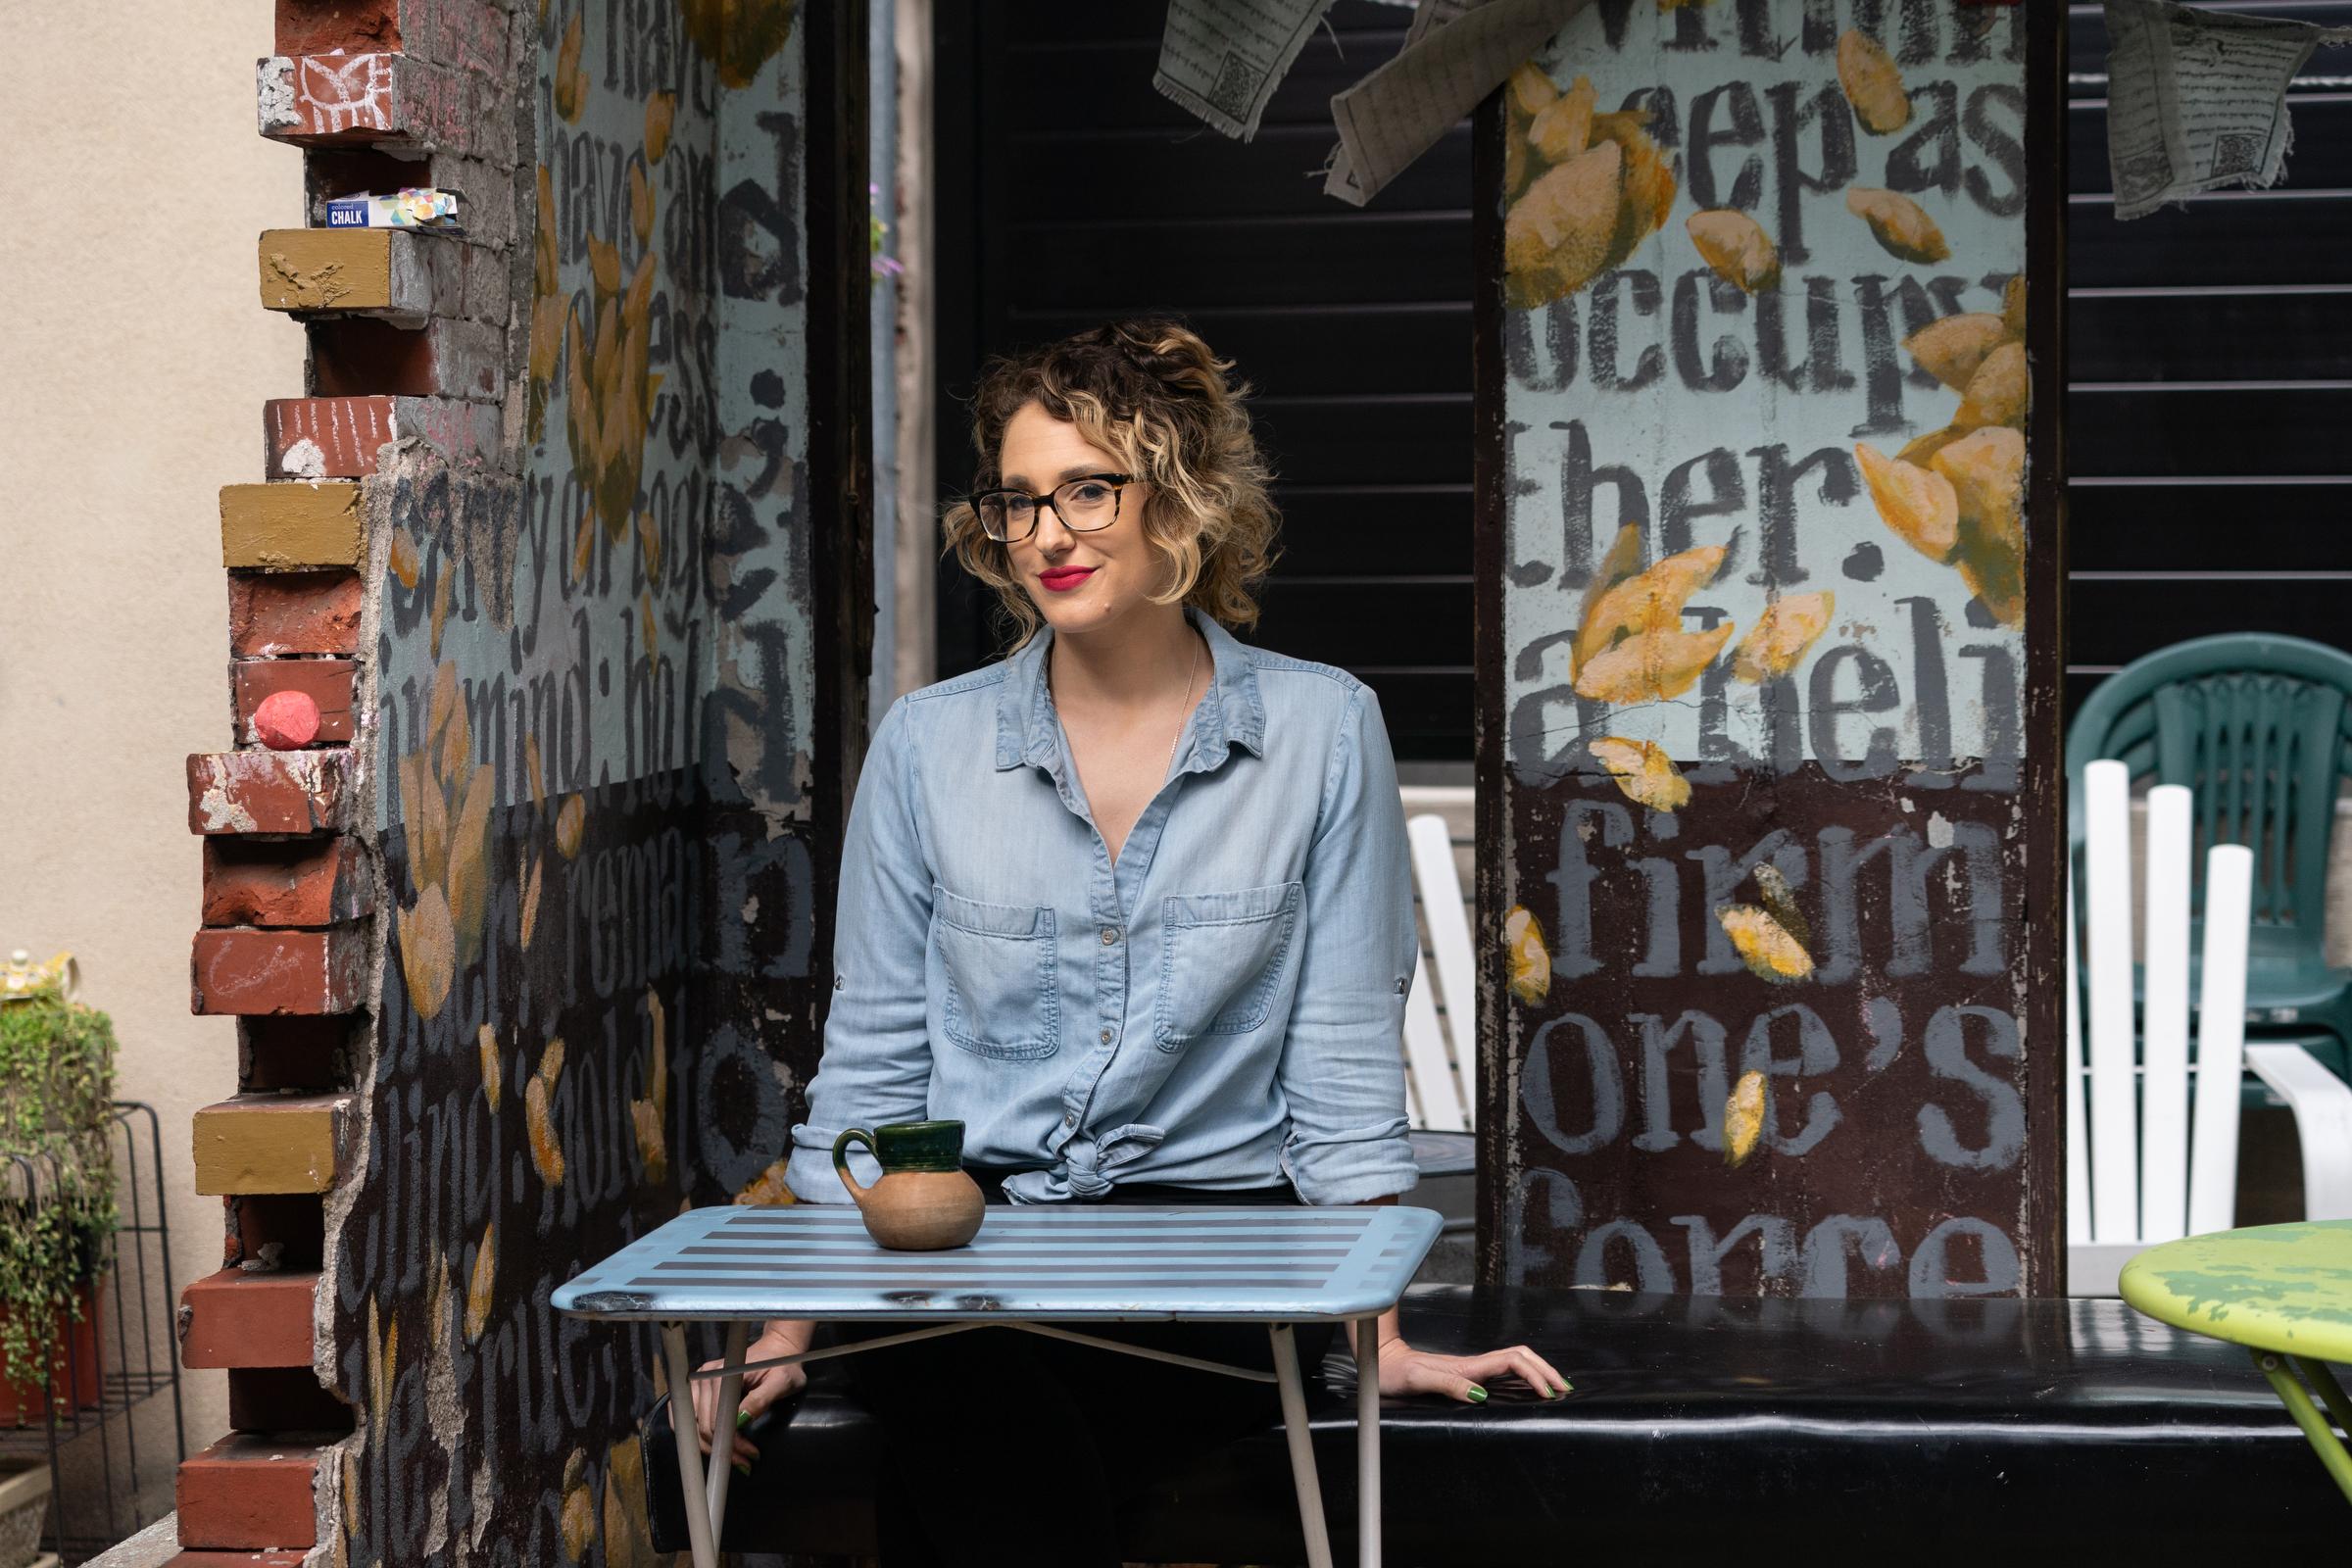 Writer-activist-researcher Melissa Fabello, shown here at the Random Tea Room, 713 N 4th St, Philadelphia, October 29, 2018.